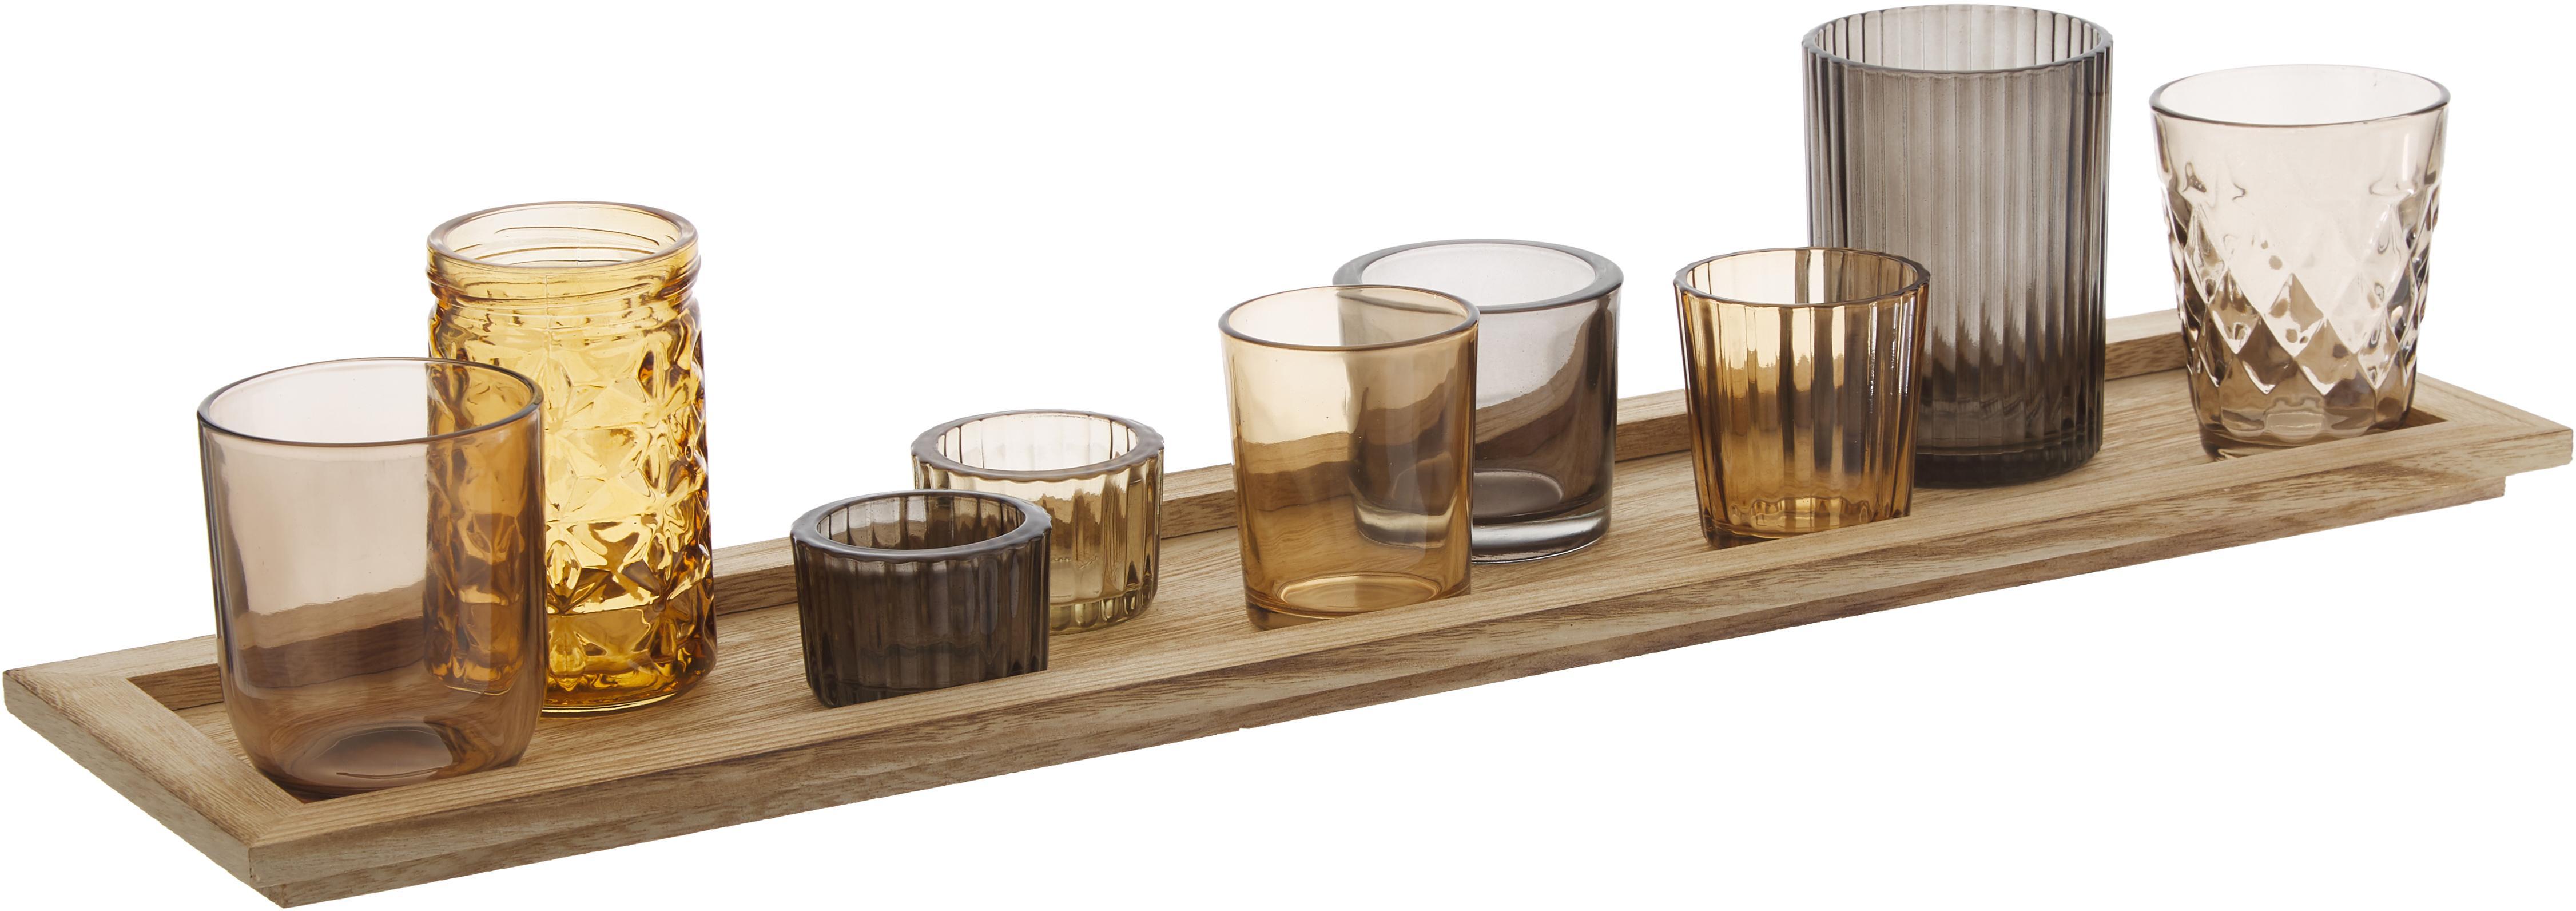 Set de portavelas Wessel, 10pzas., Portavelas: vidrio, Bandeja: madera de Paulownia, Tonos marrones, An 56 x Al 10 cm